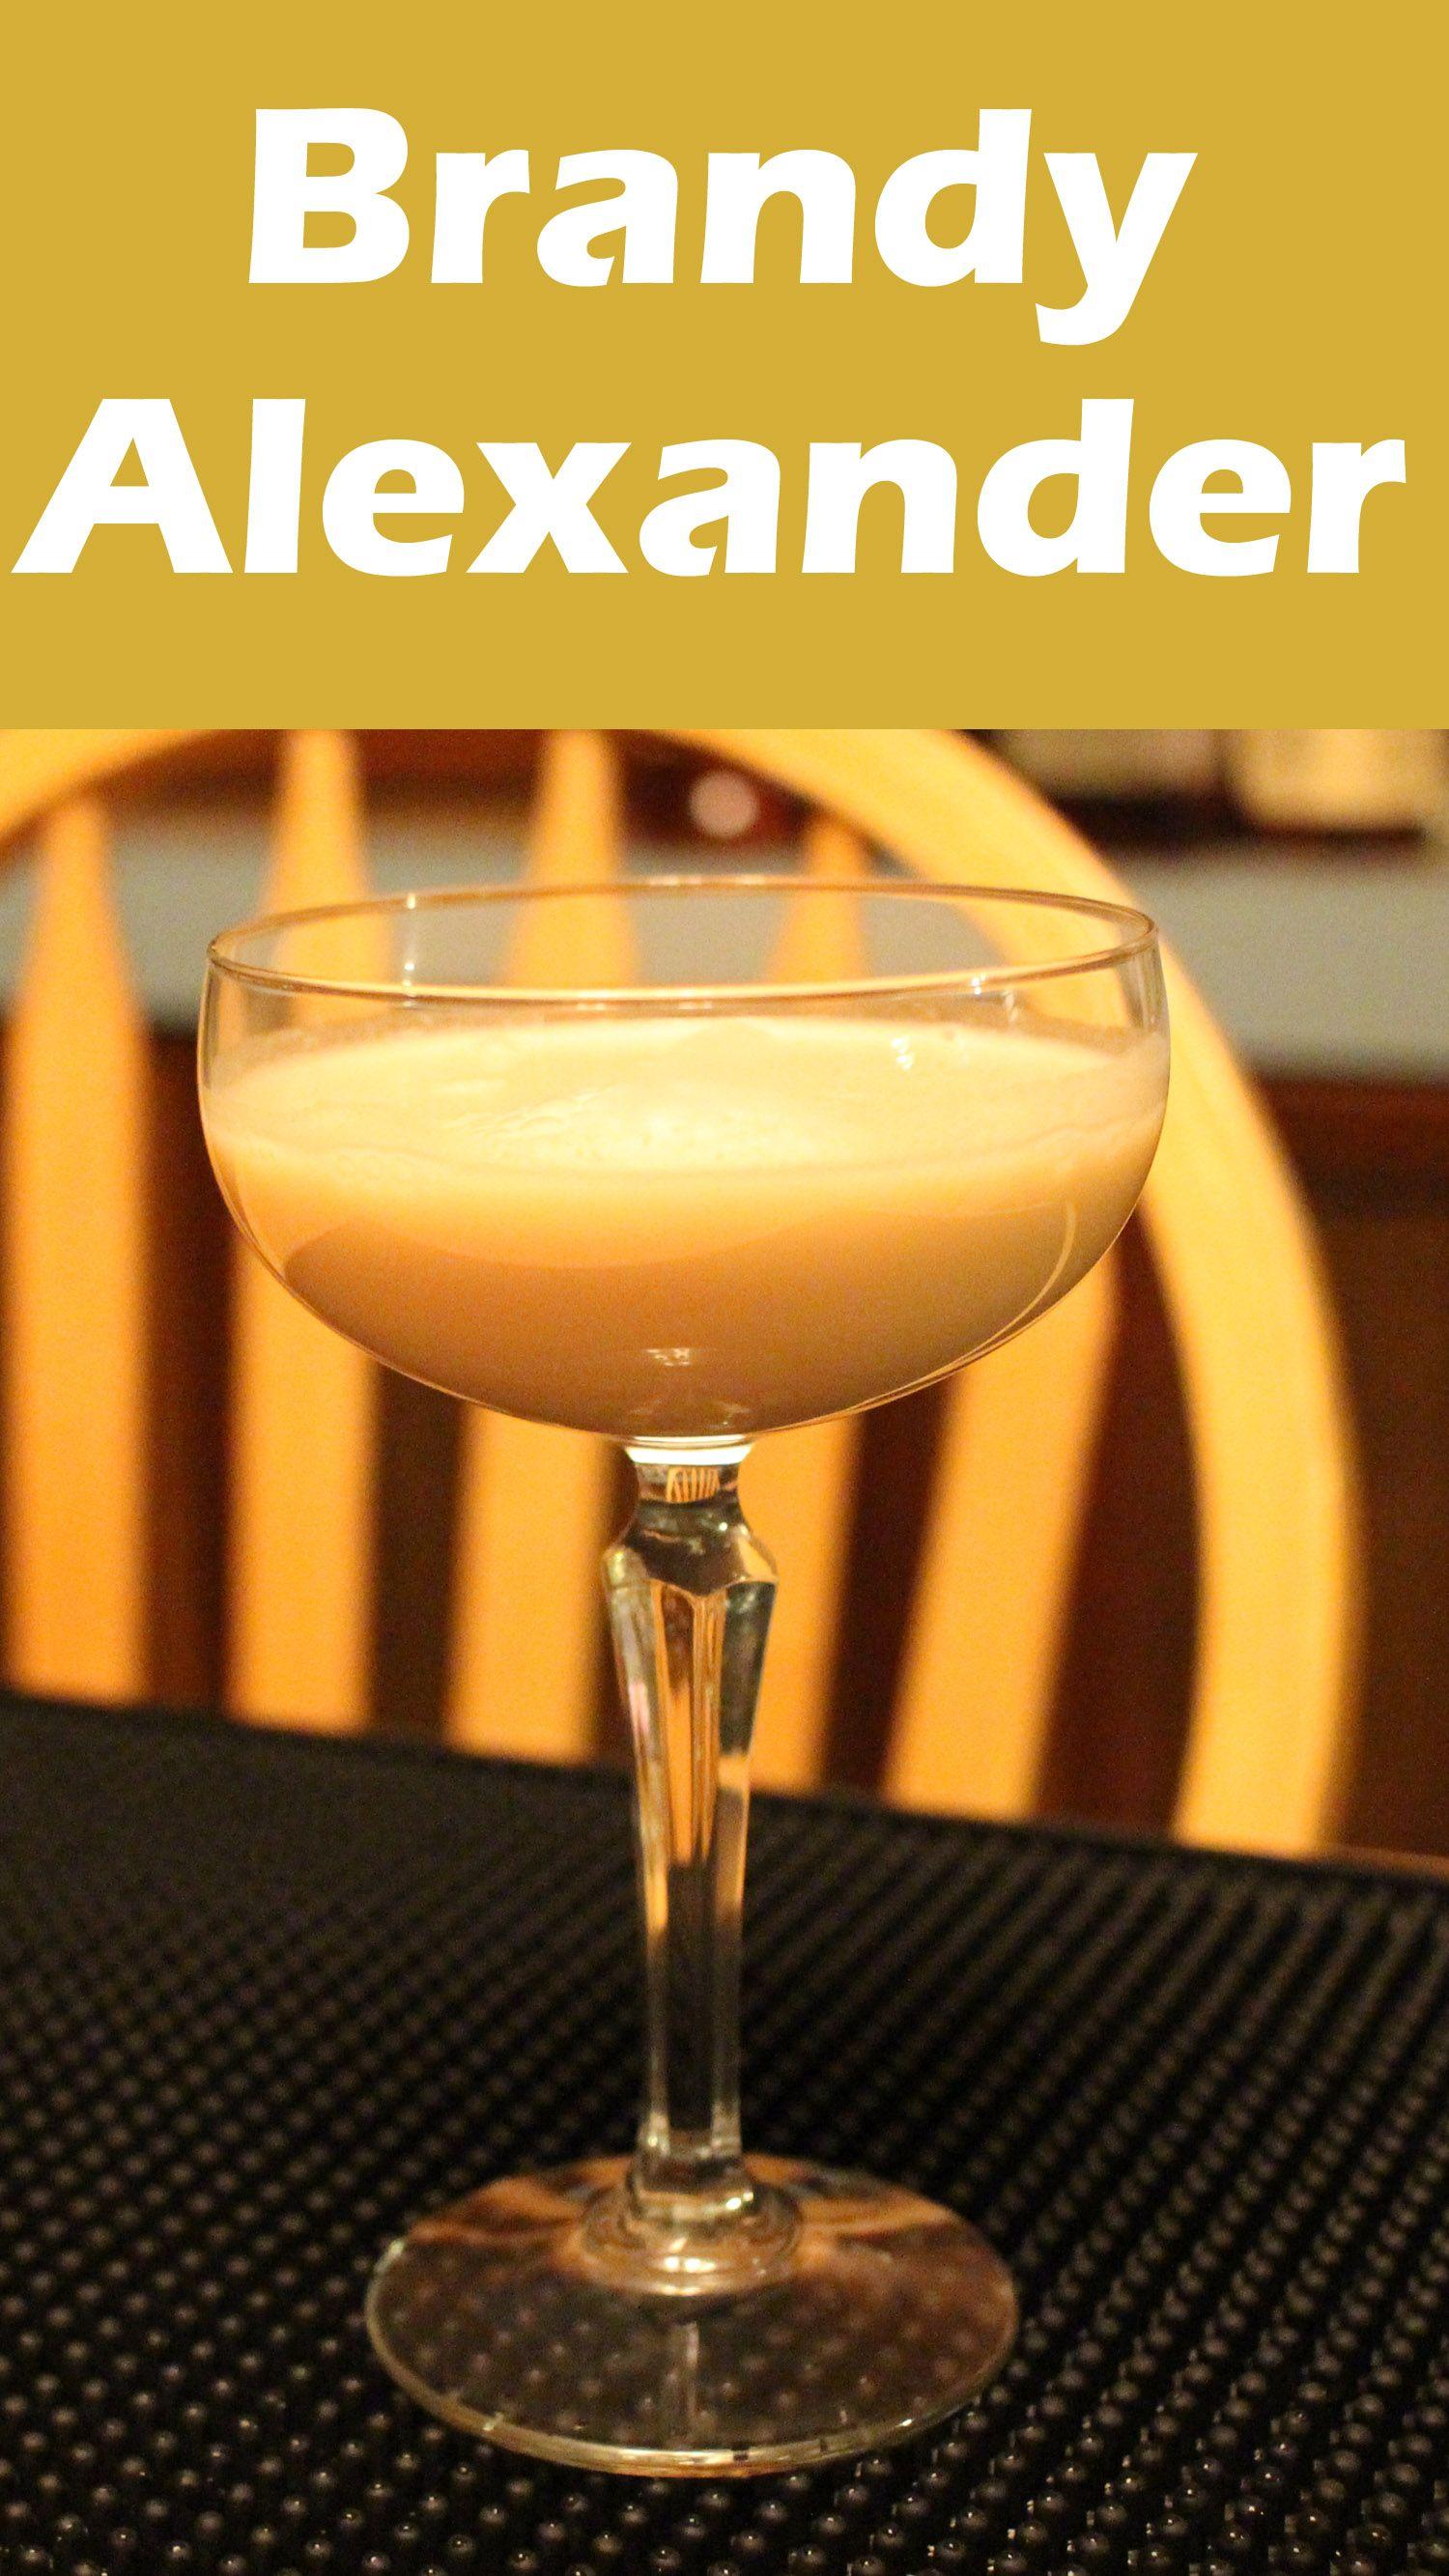 Brandy Alexander Cocktail An Awesome Drink Recipe Brandy